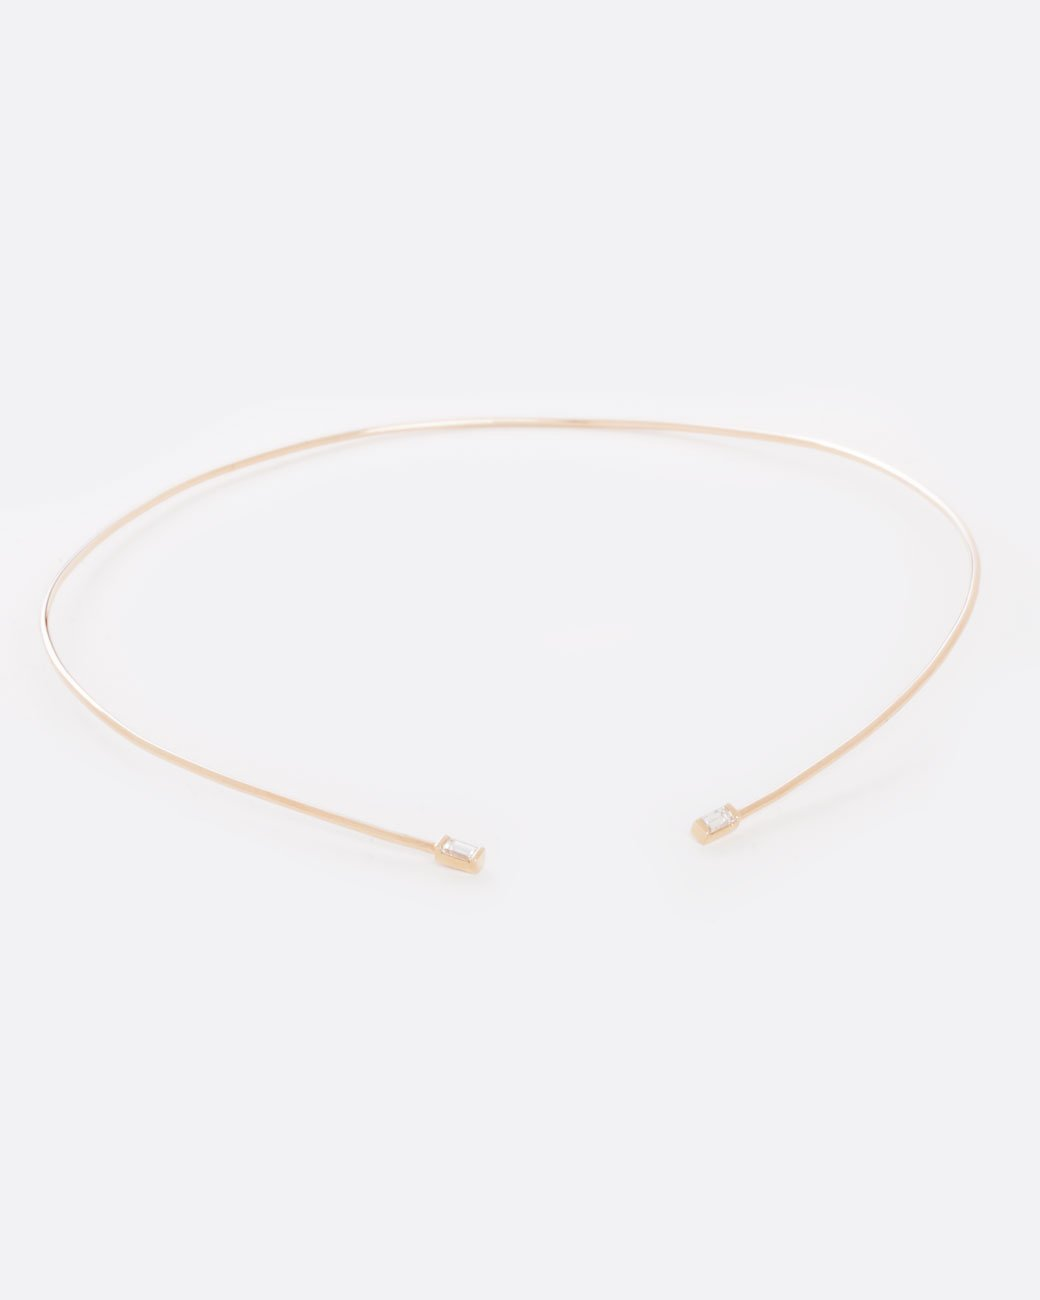 Selin Kent delicate gold necklace choker